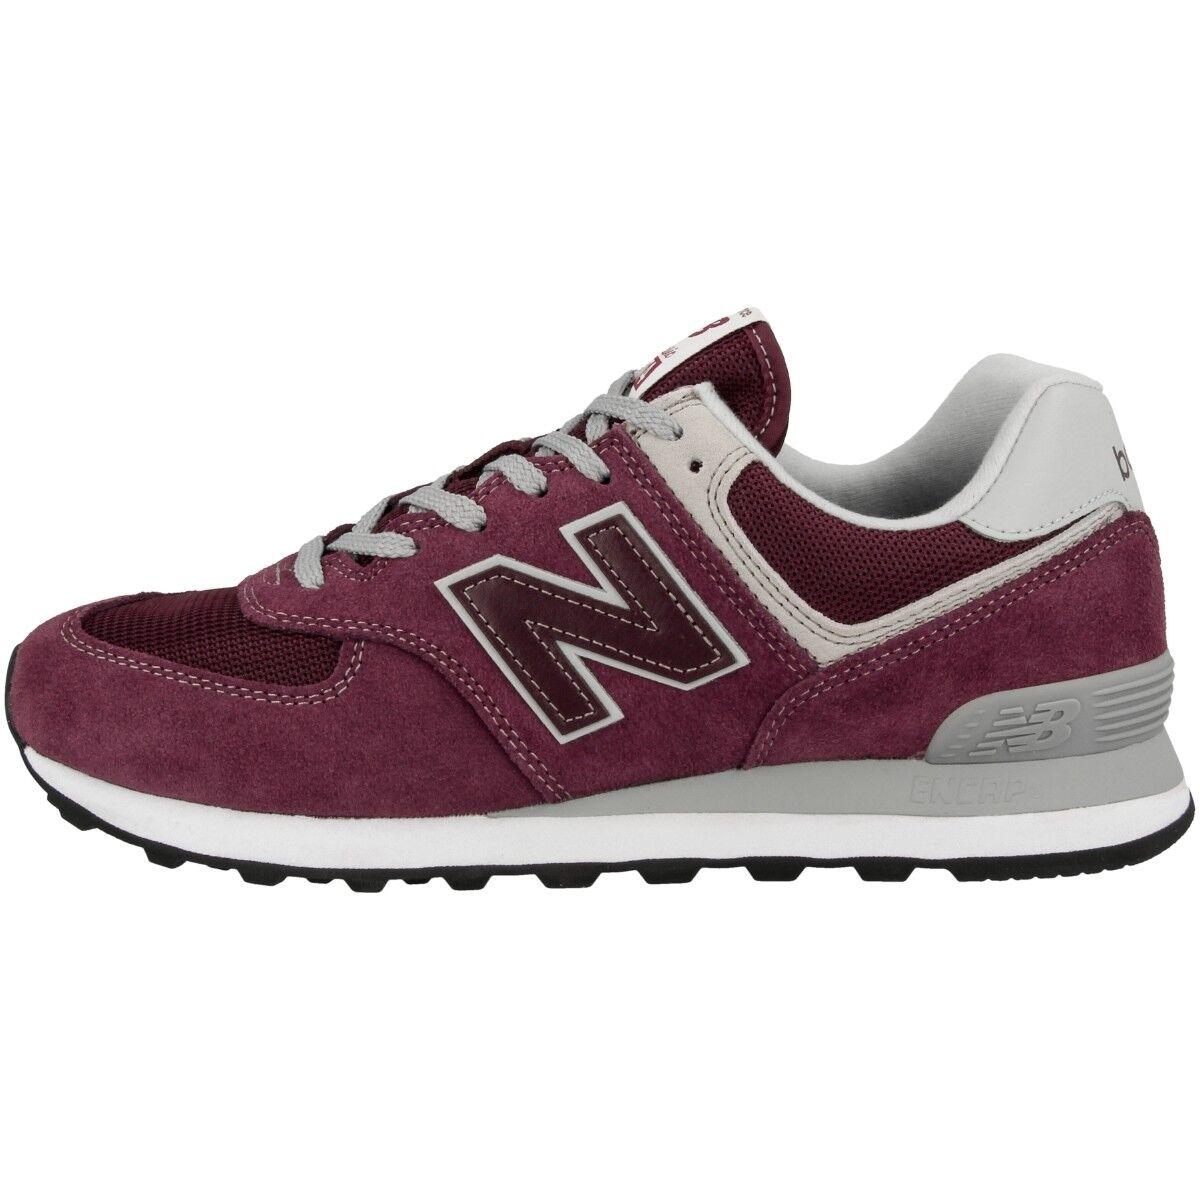 New Balance ML 574 EGB Schuhe Essential Freizeit Sport Sneaker burgundy ML574EGB